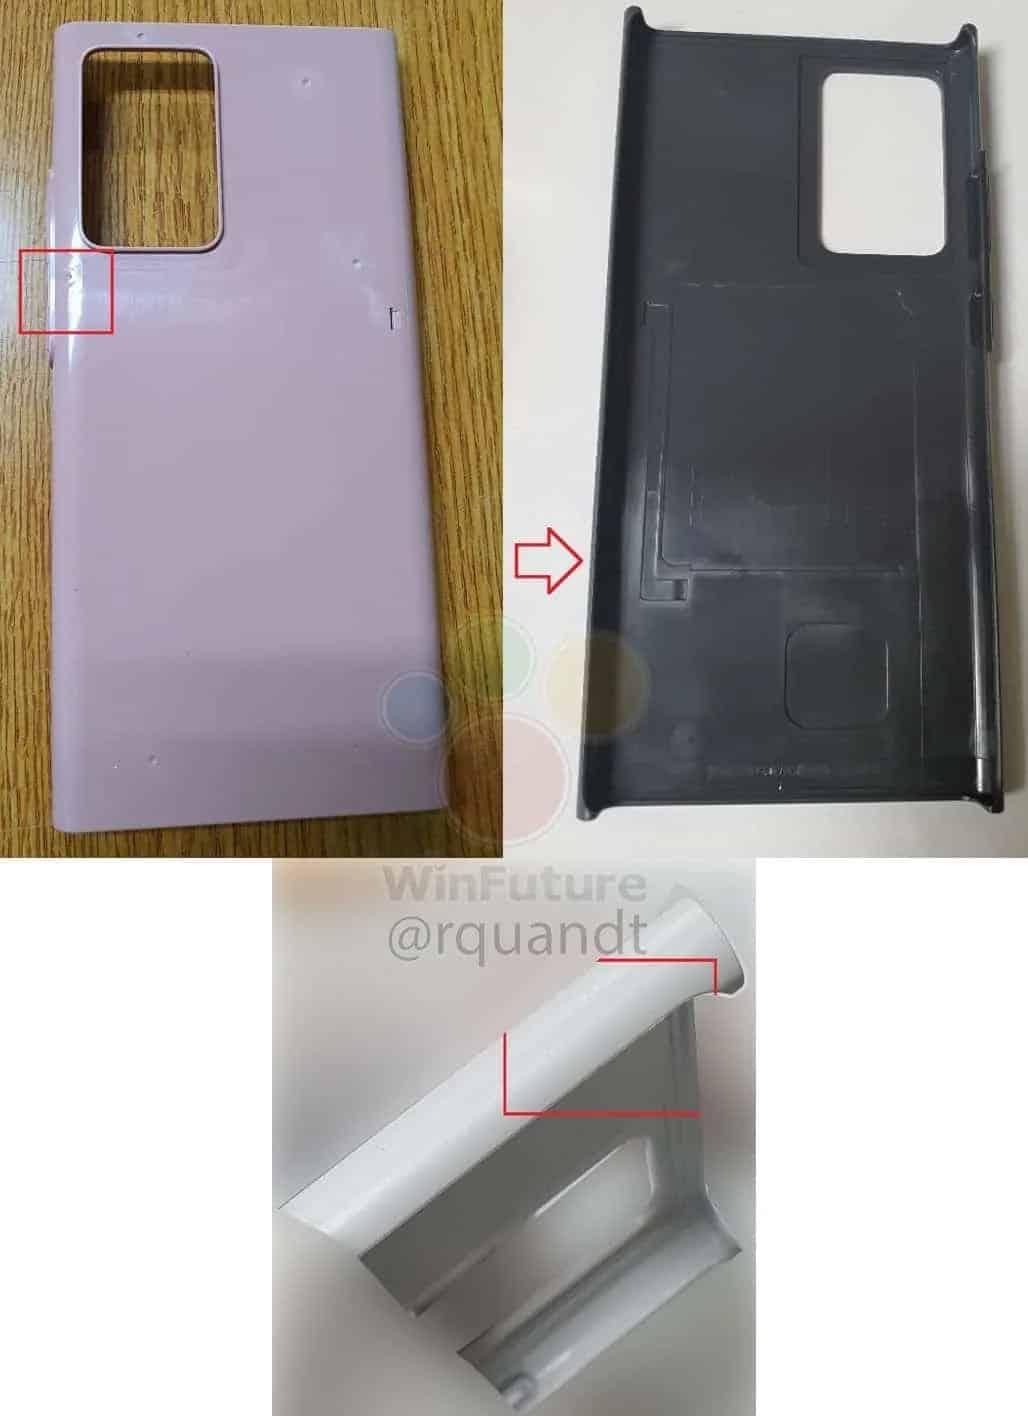 Design do Galaxy Note 20